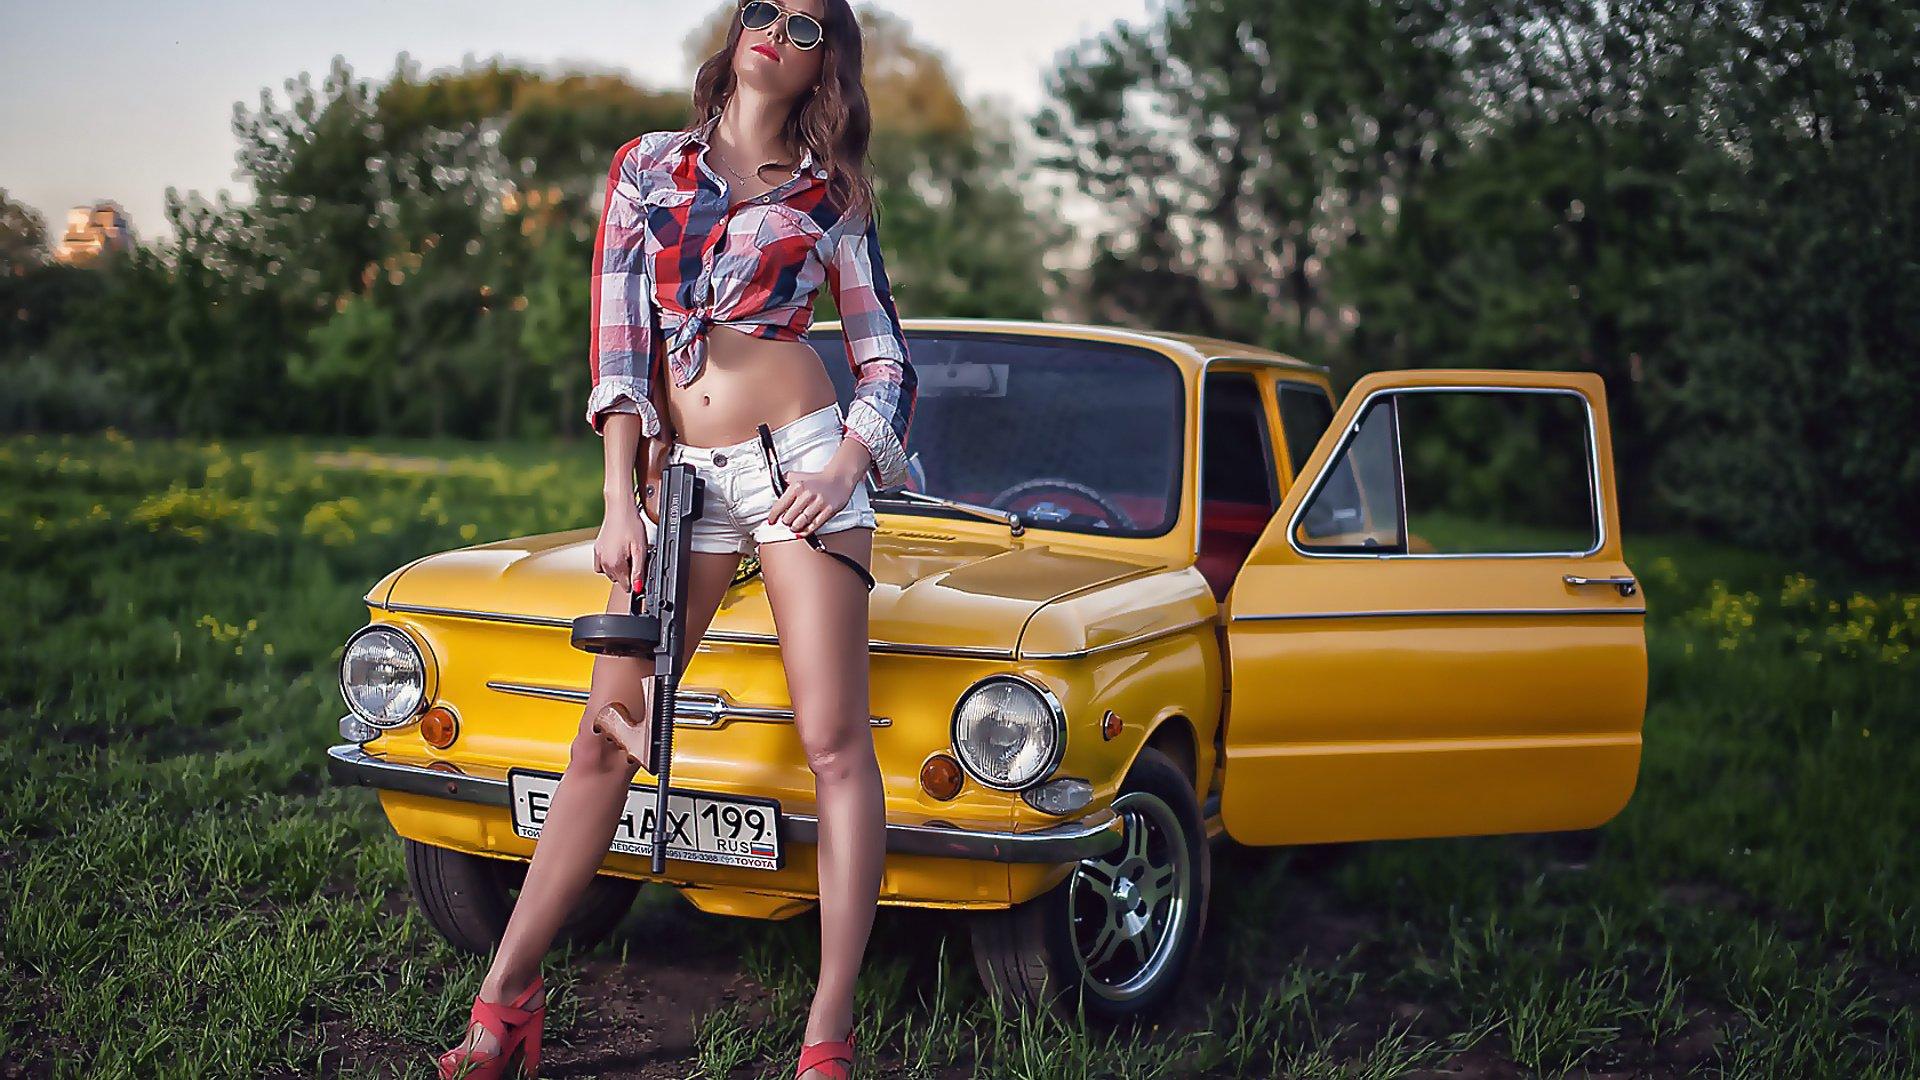 Фото голые девушки и ваз, Ваз и девушки ВКонтакте 27 фотография